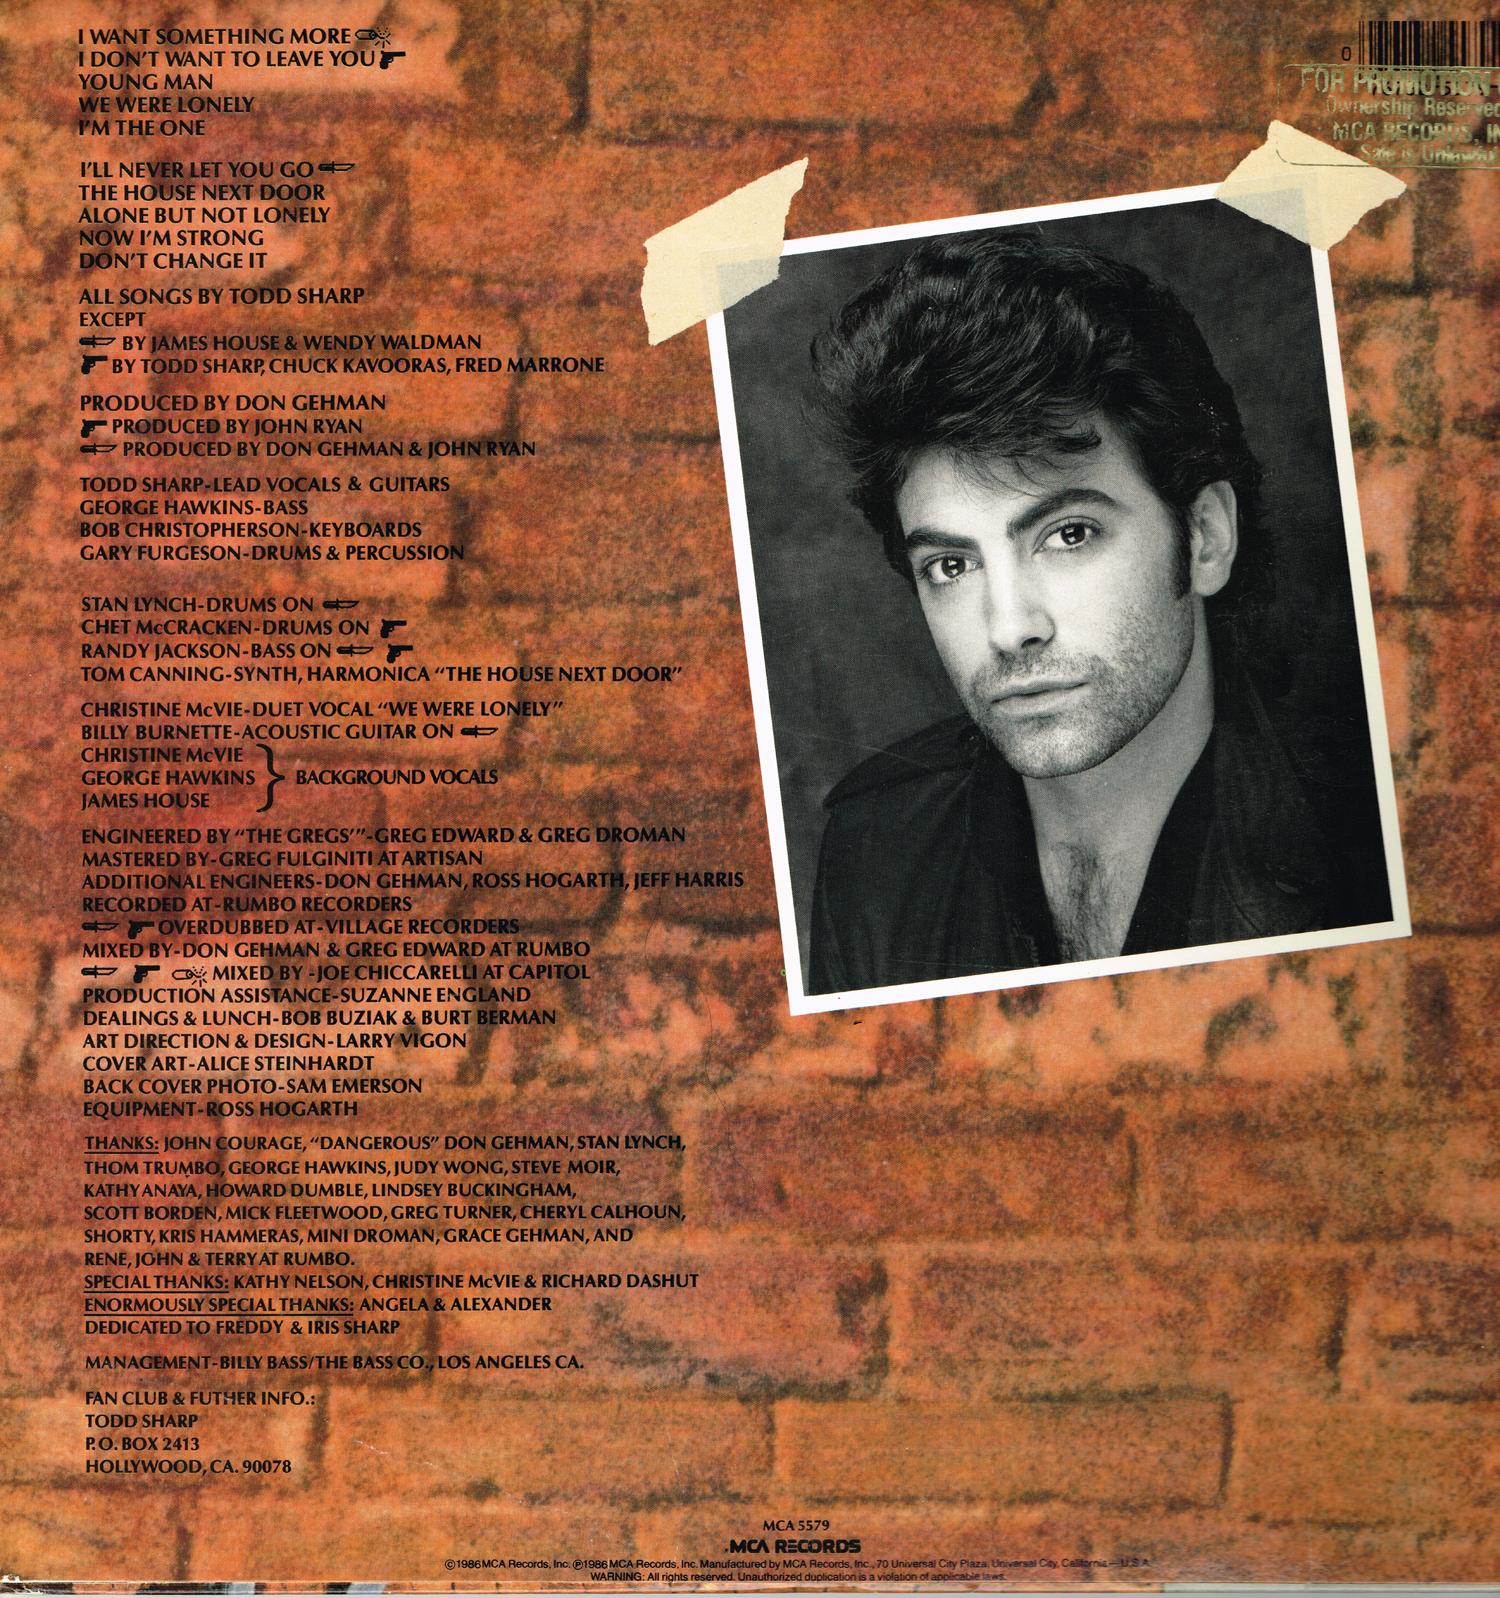 WhoAmI_MCA 1986rear.jpg